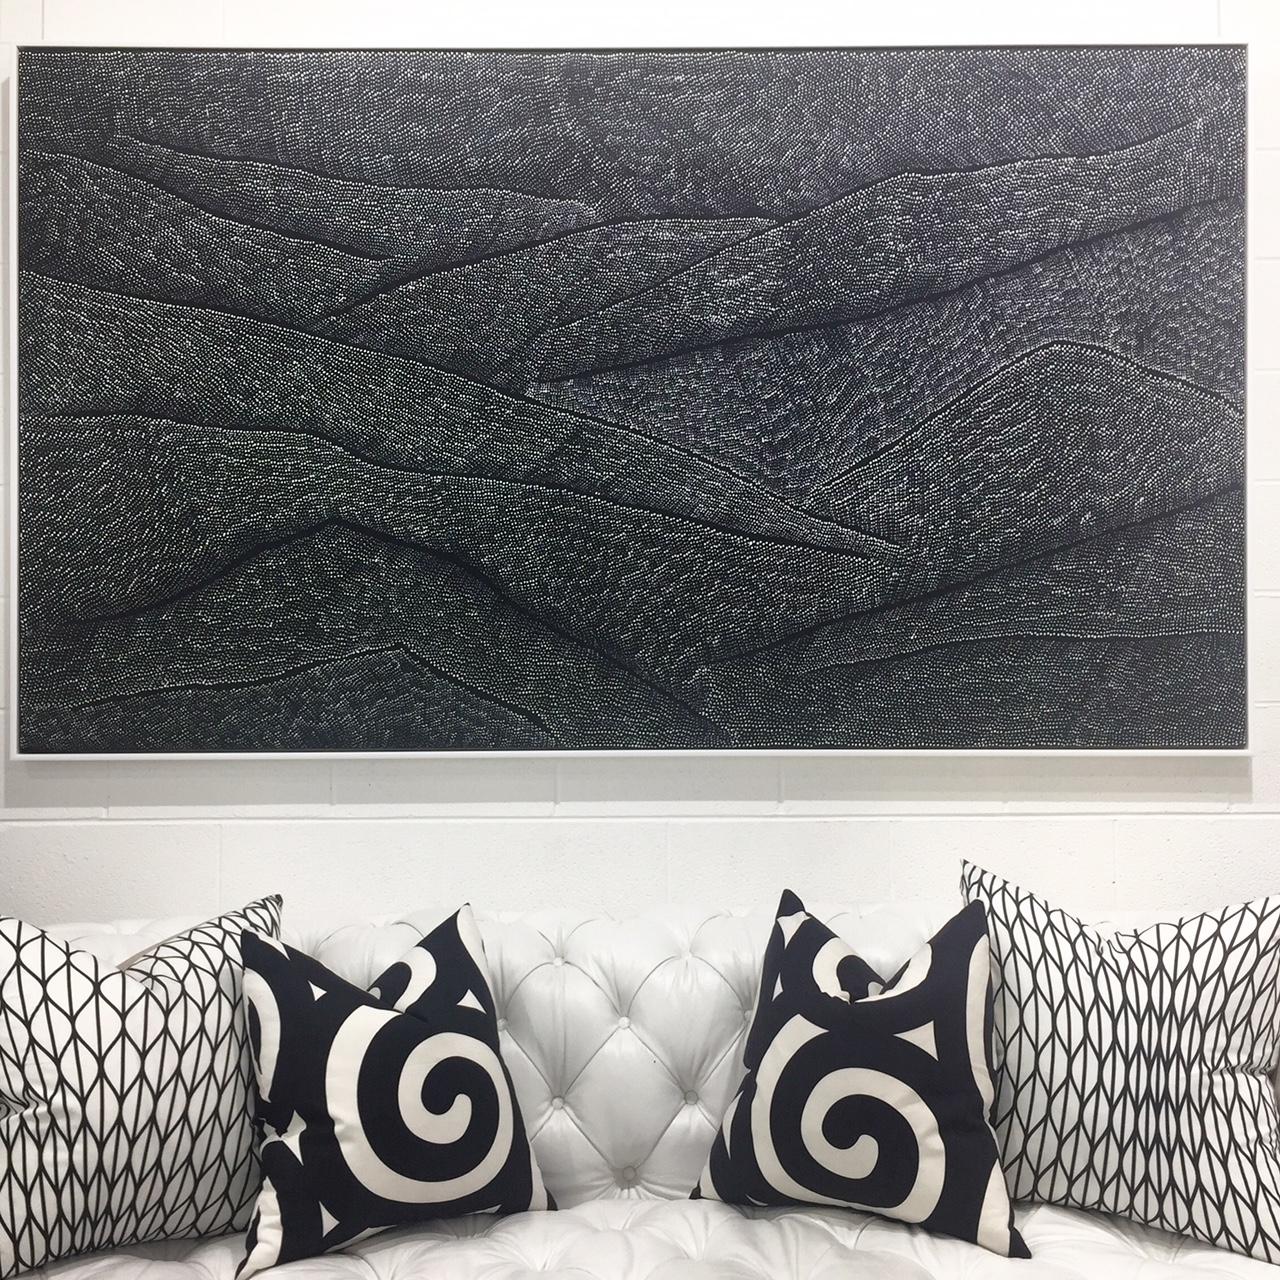 Above: Lily Kelly Napangati,  Tuli Tuli (Sand Dunes)  2017, Acrylic Paint on Linen, 122 x 212cm, P.O.A